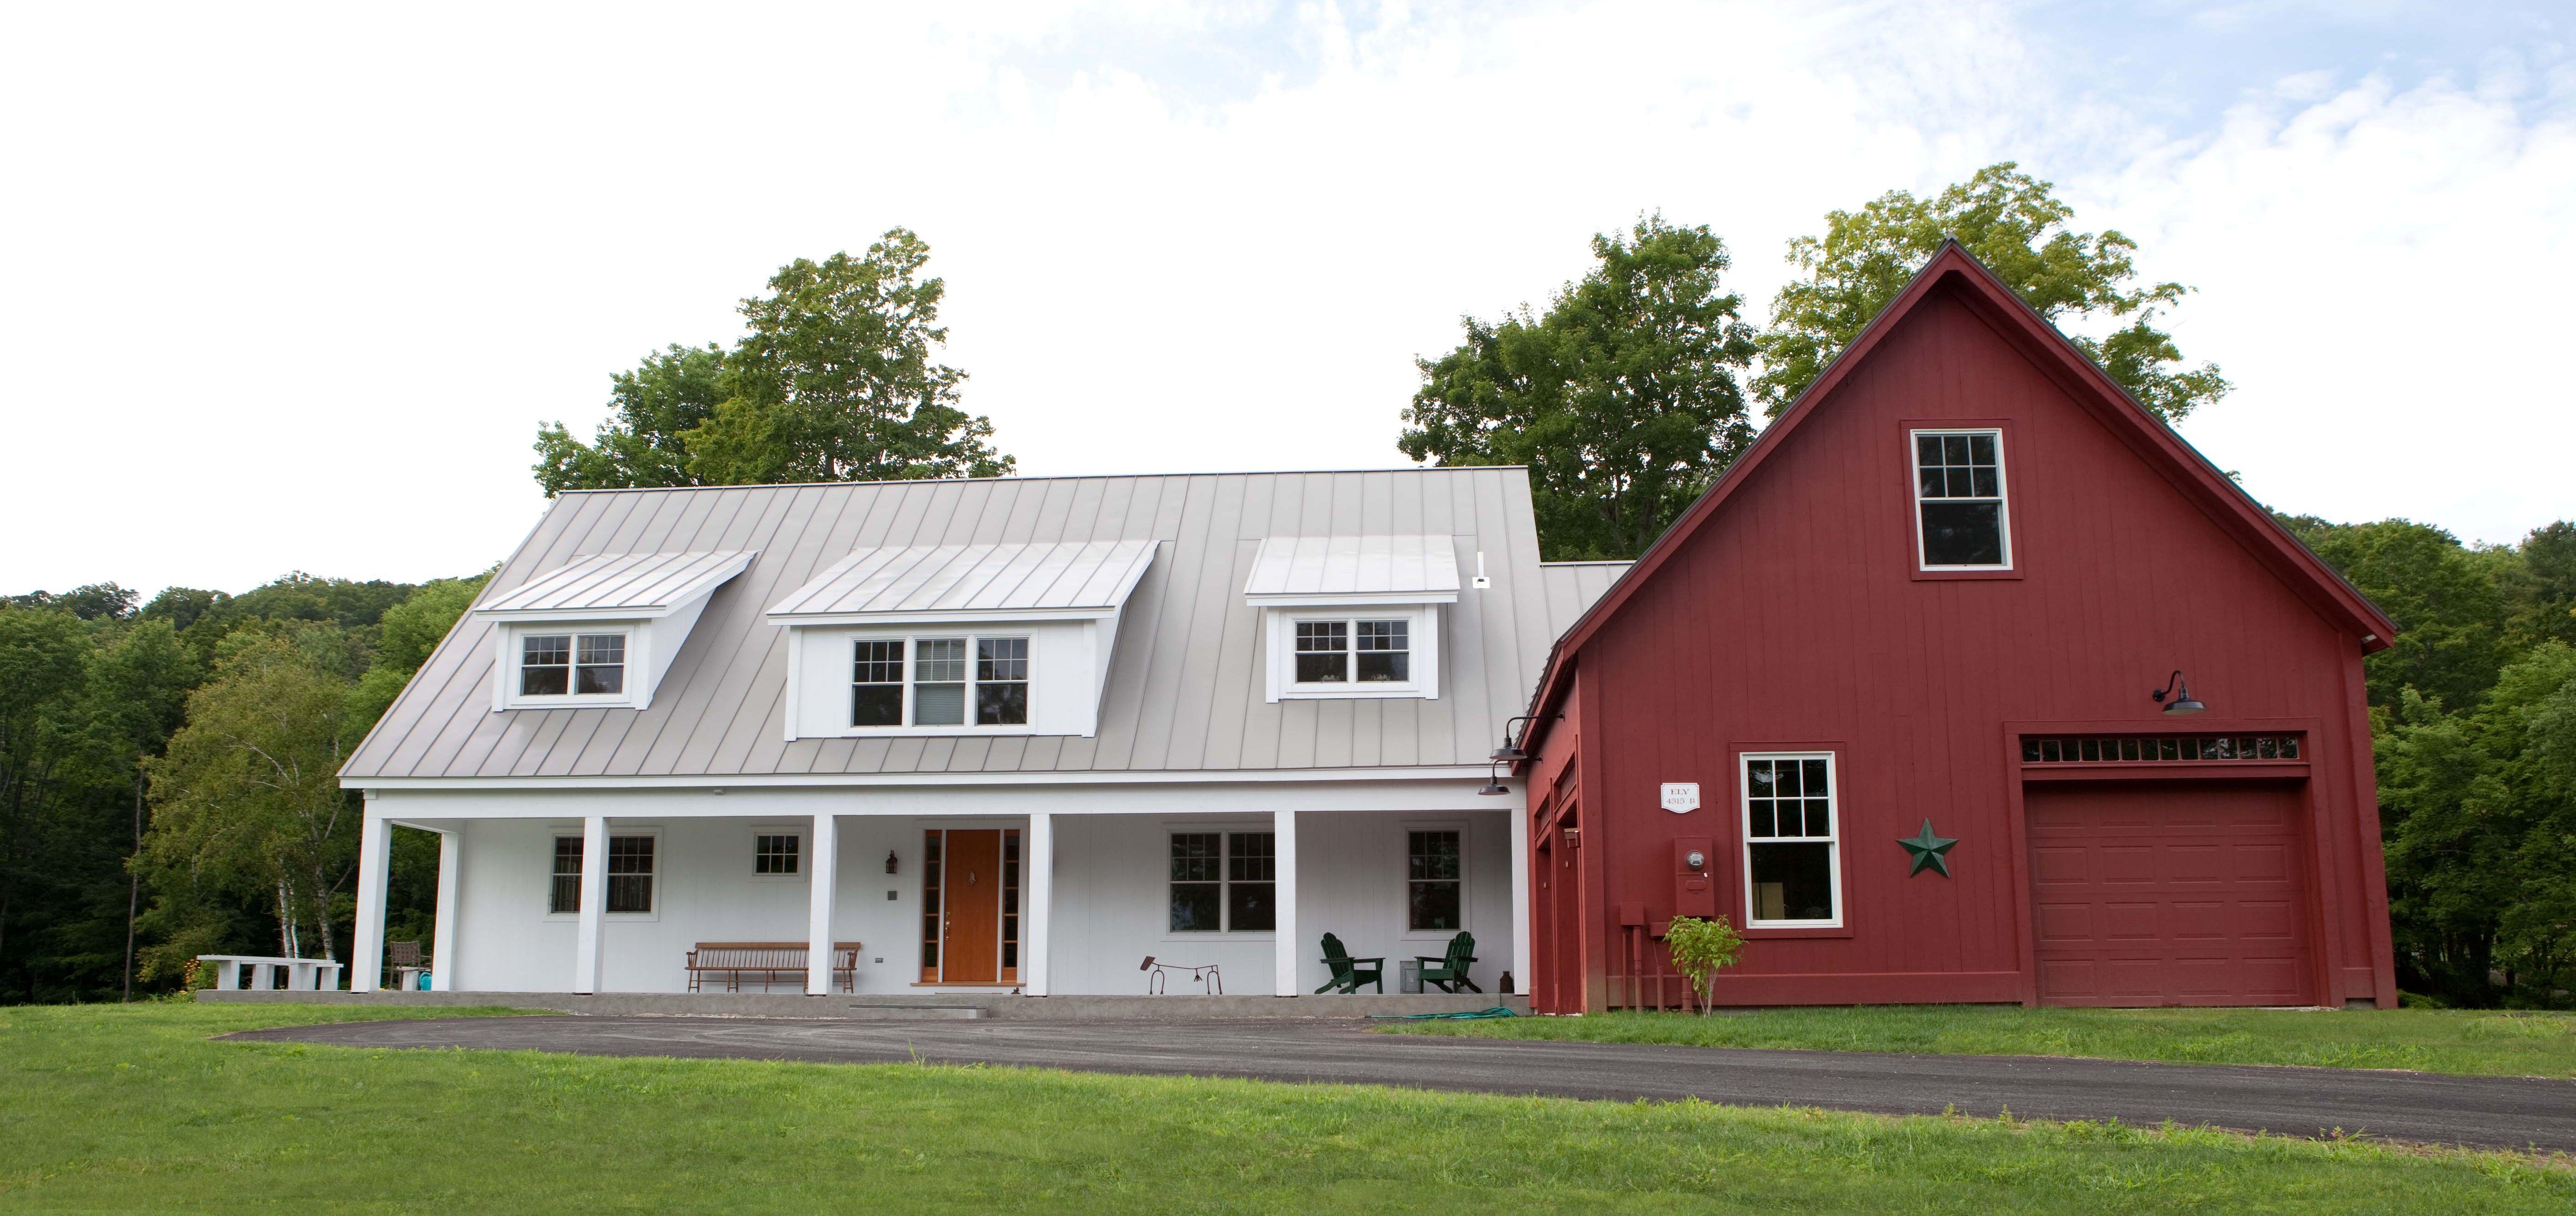 Morgan farmhouse farmhouse design square feet and living spaces